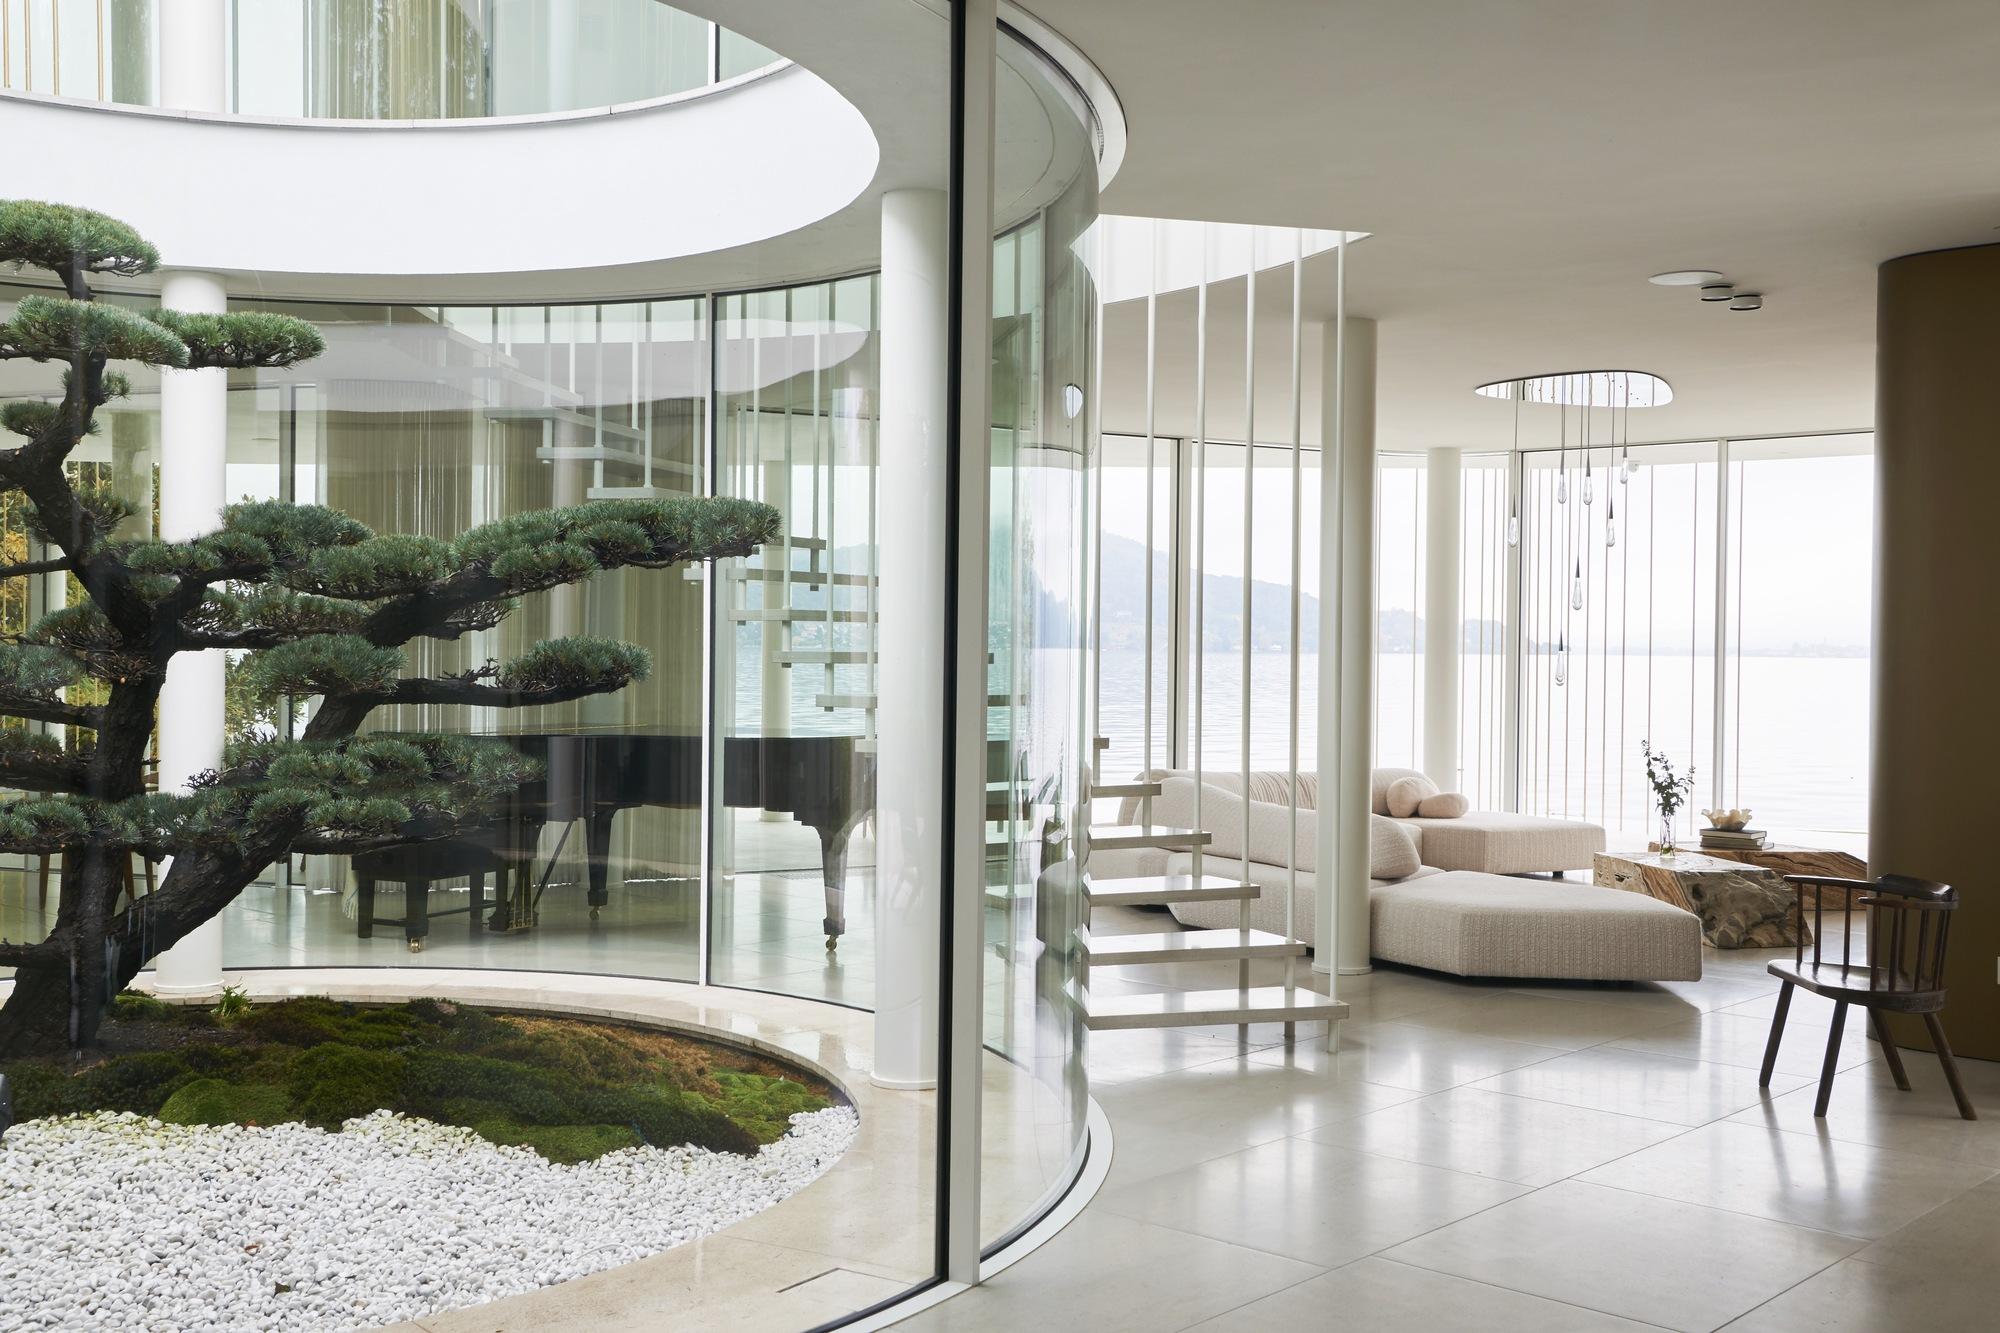 Casa villa mosca bianca design haus liberty plataforma for Design hotel mosca